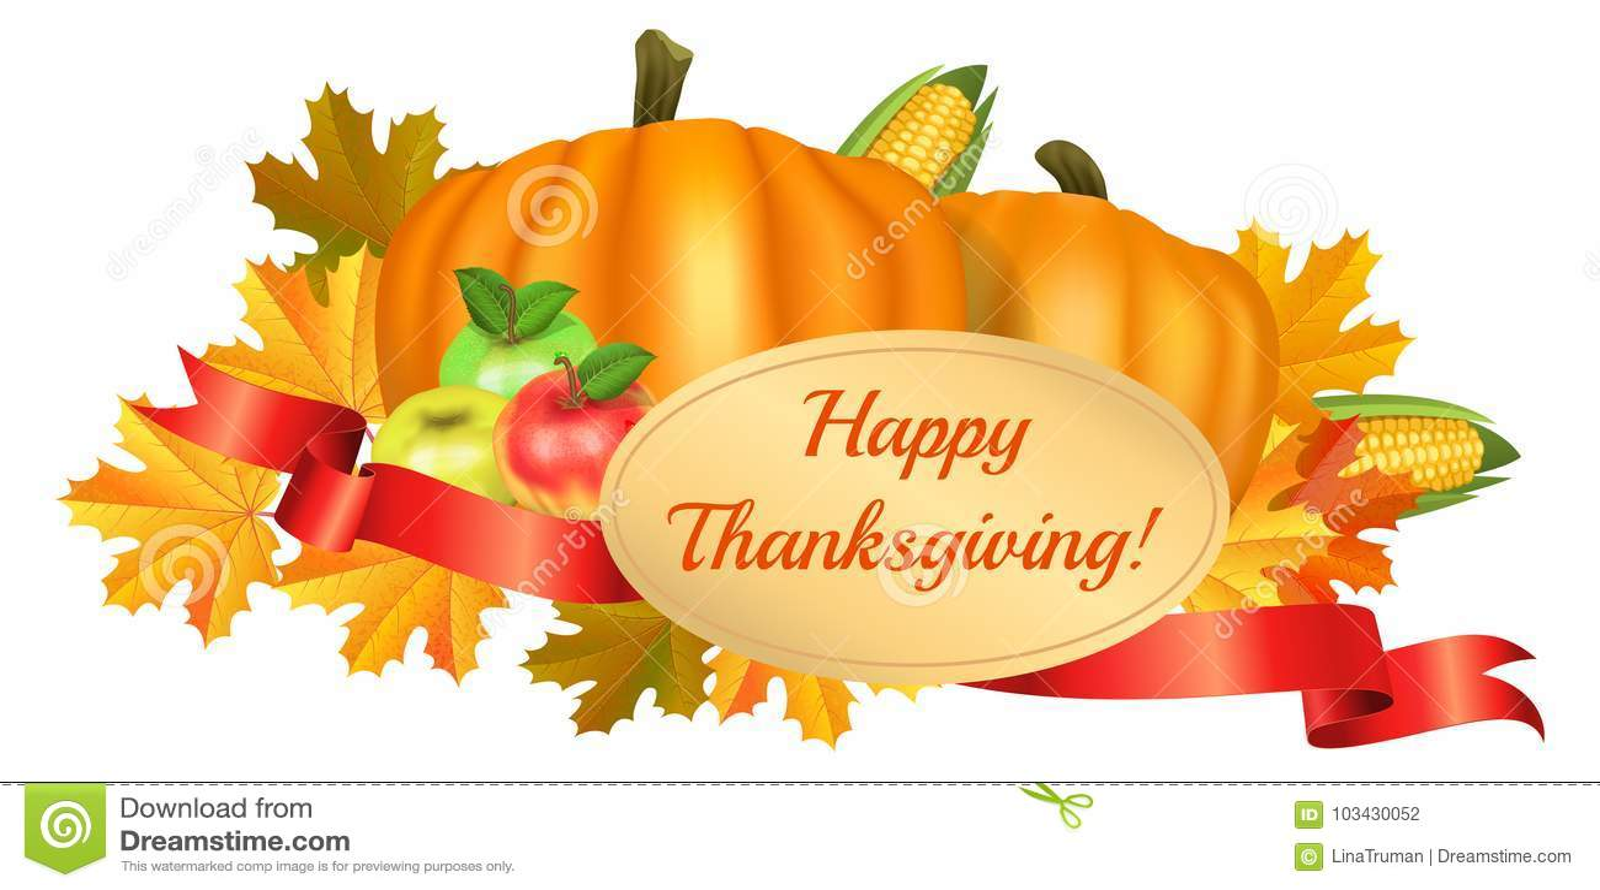 Happy Thanksgiving Greeting Card Pumpkins Corn Apples Stock